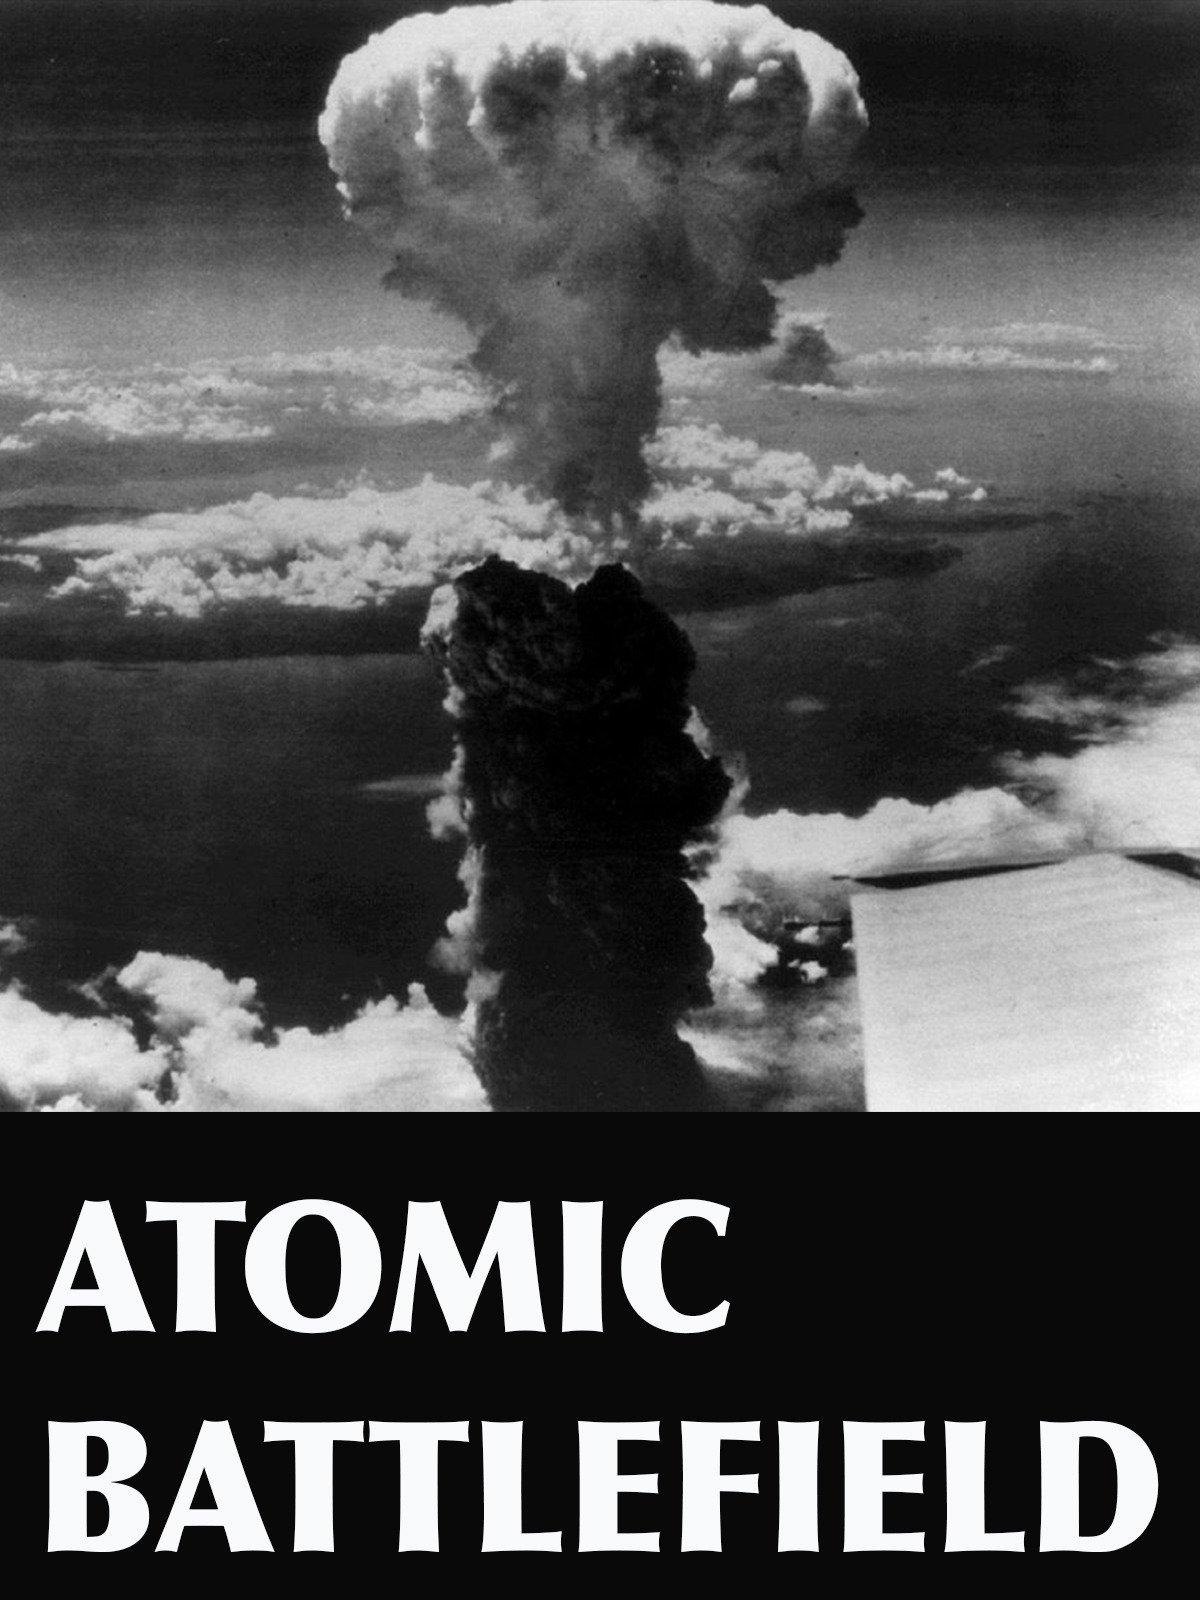 Atomic Battlefield